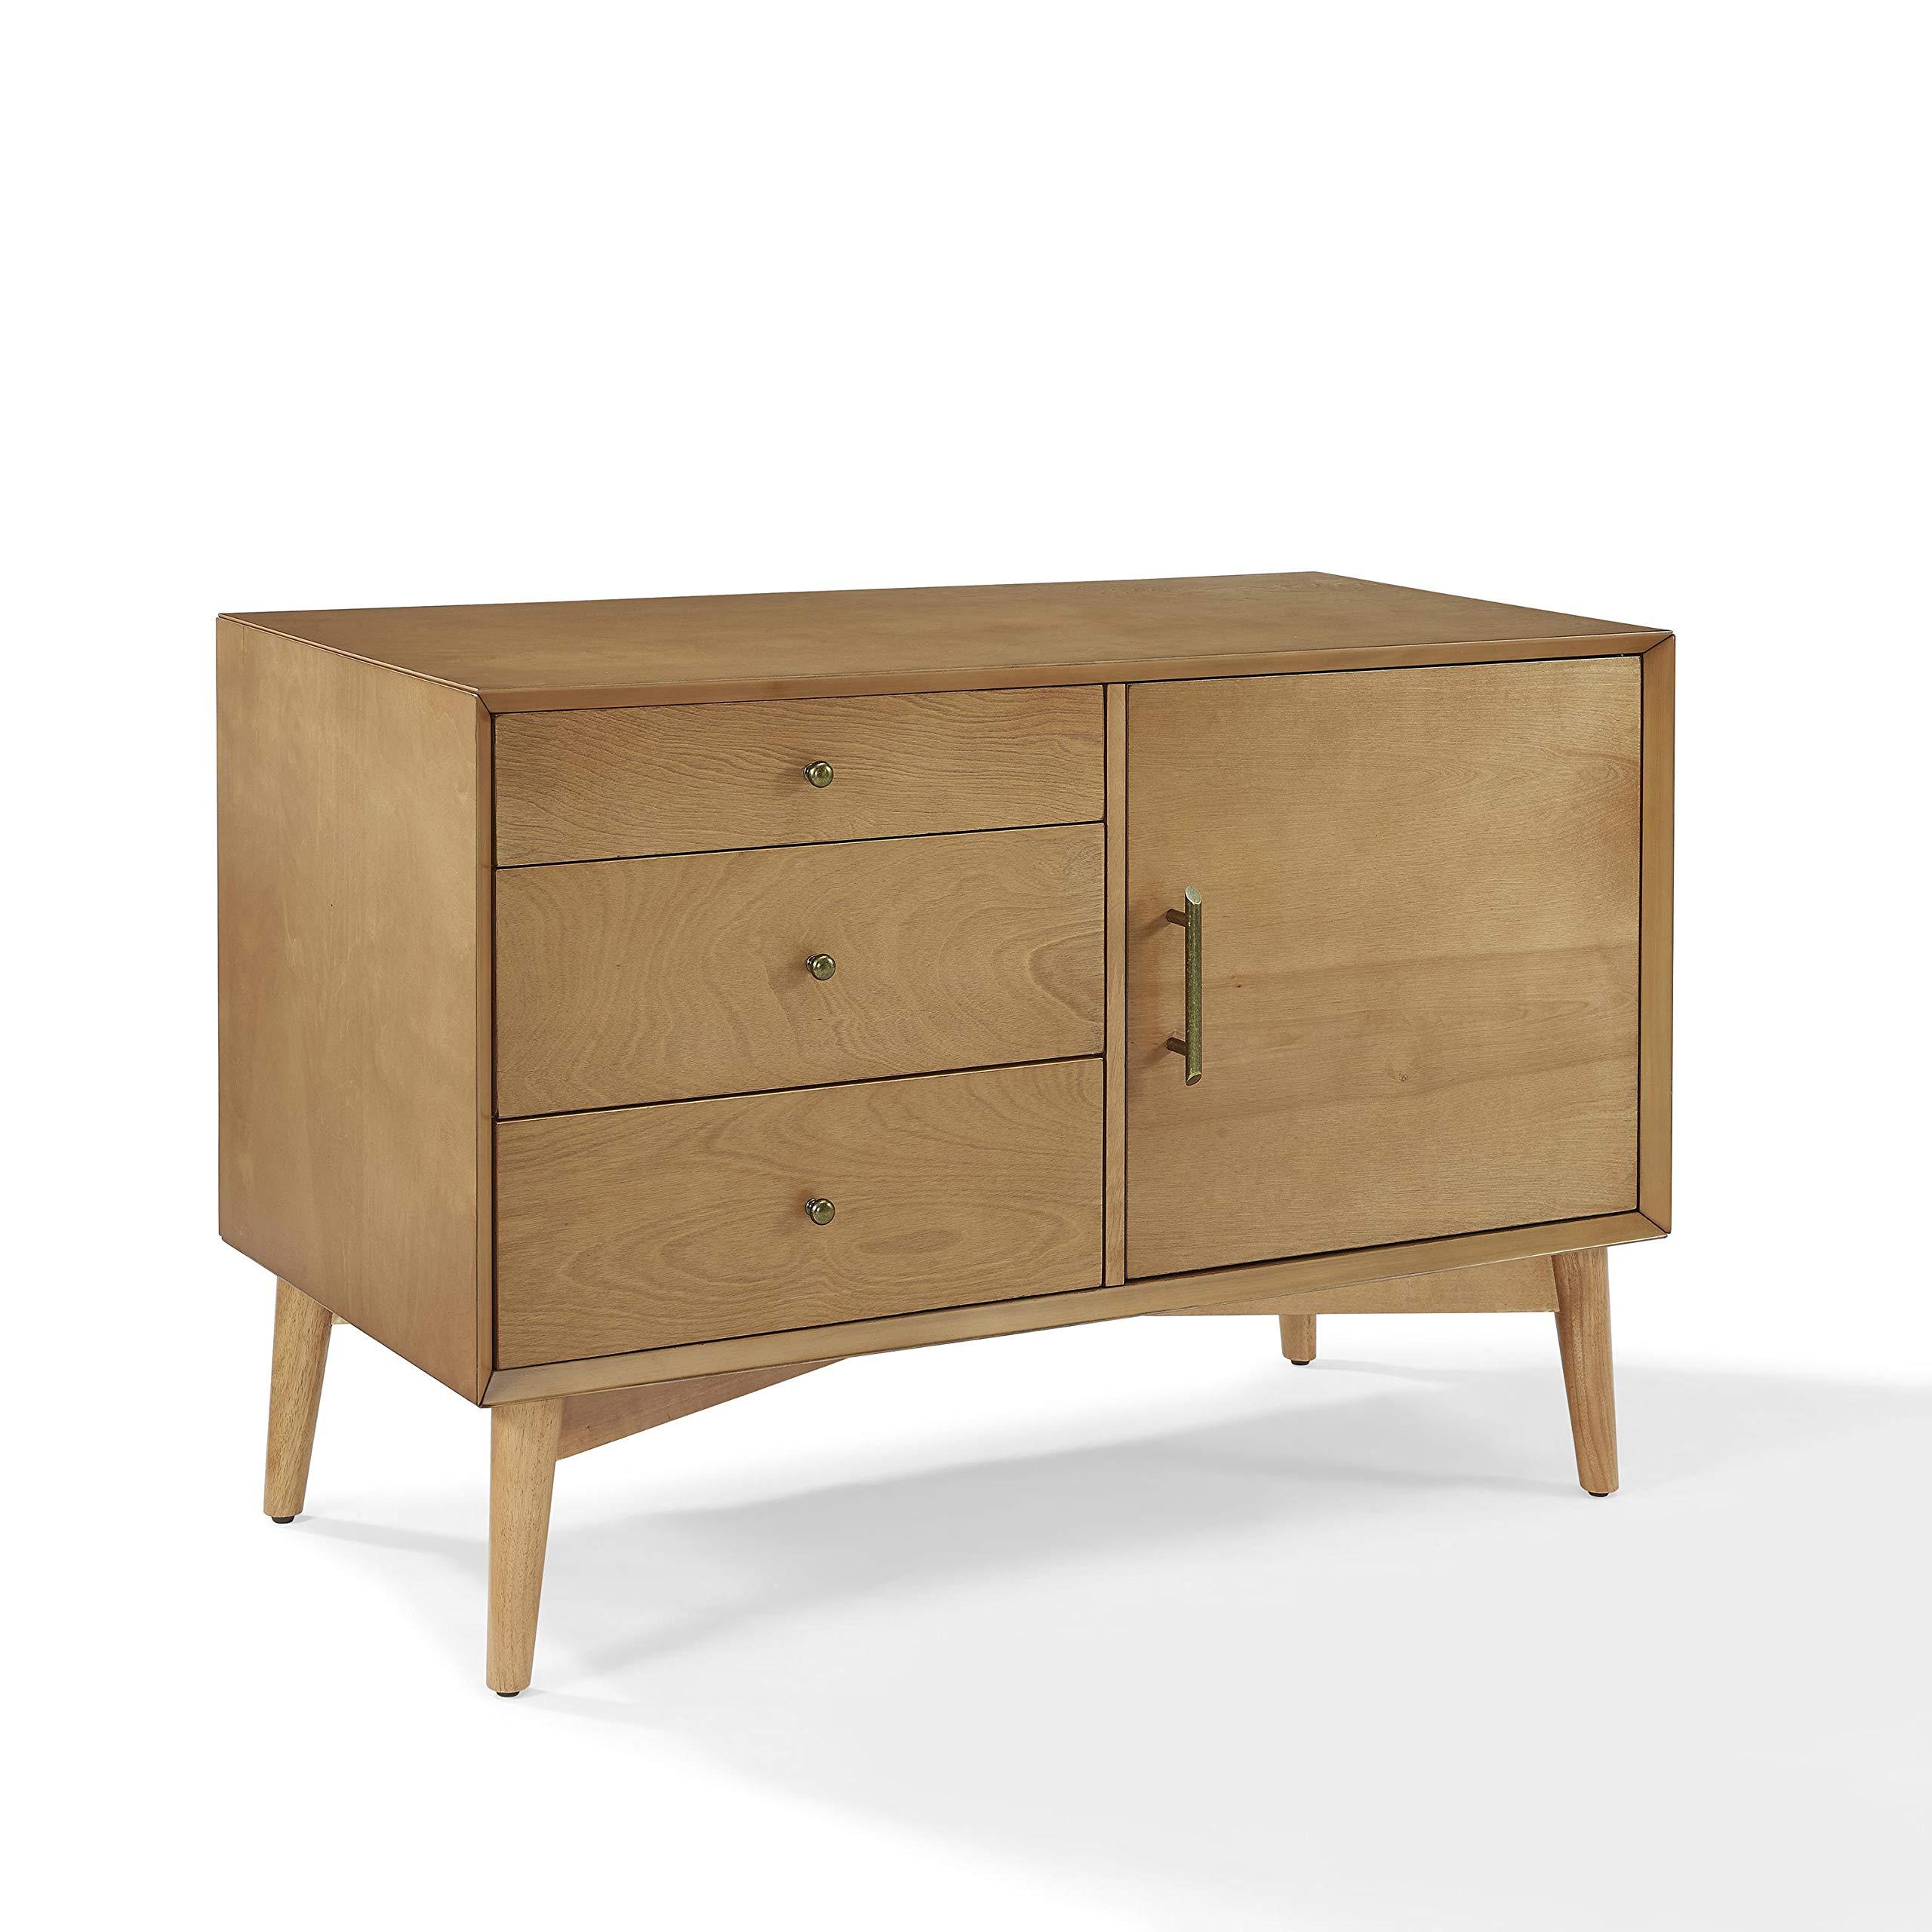 Crosley Furniture Landon Mid-Century Media Console